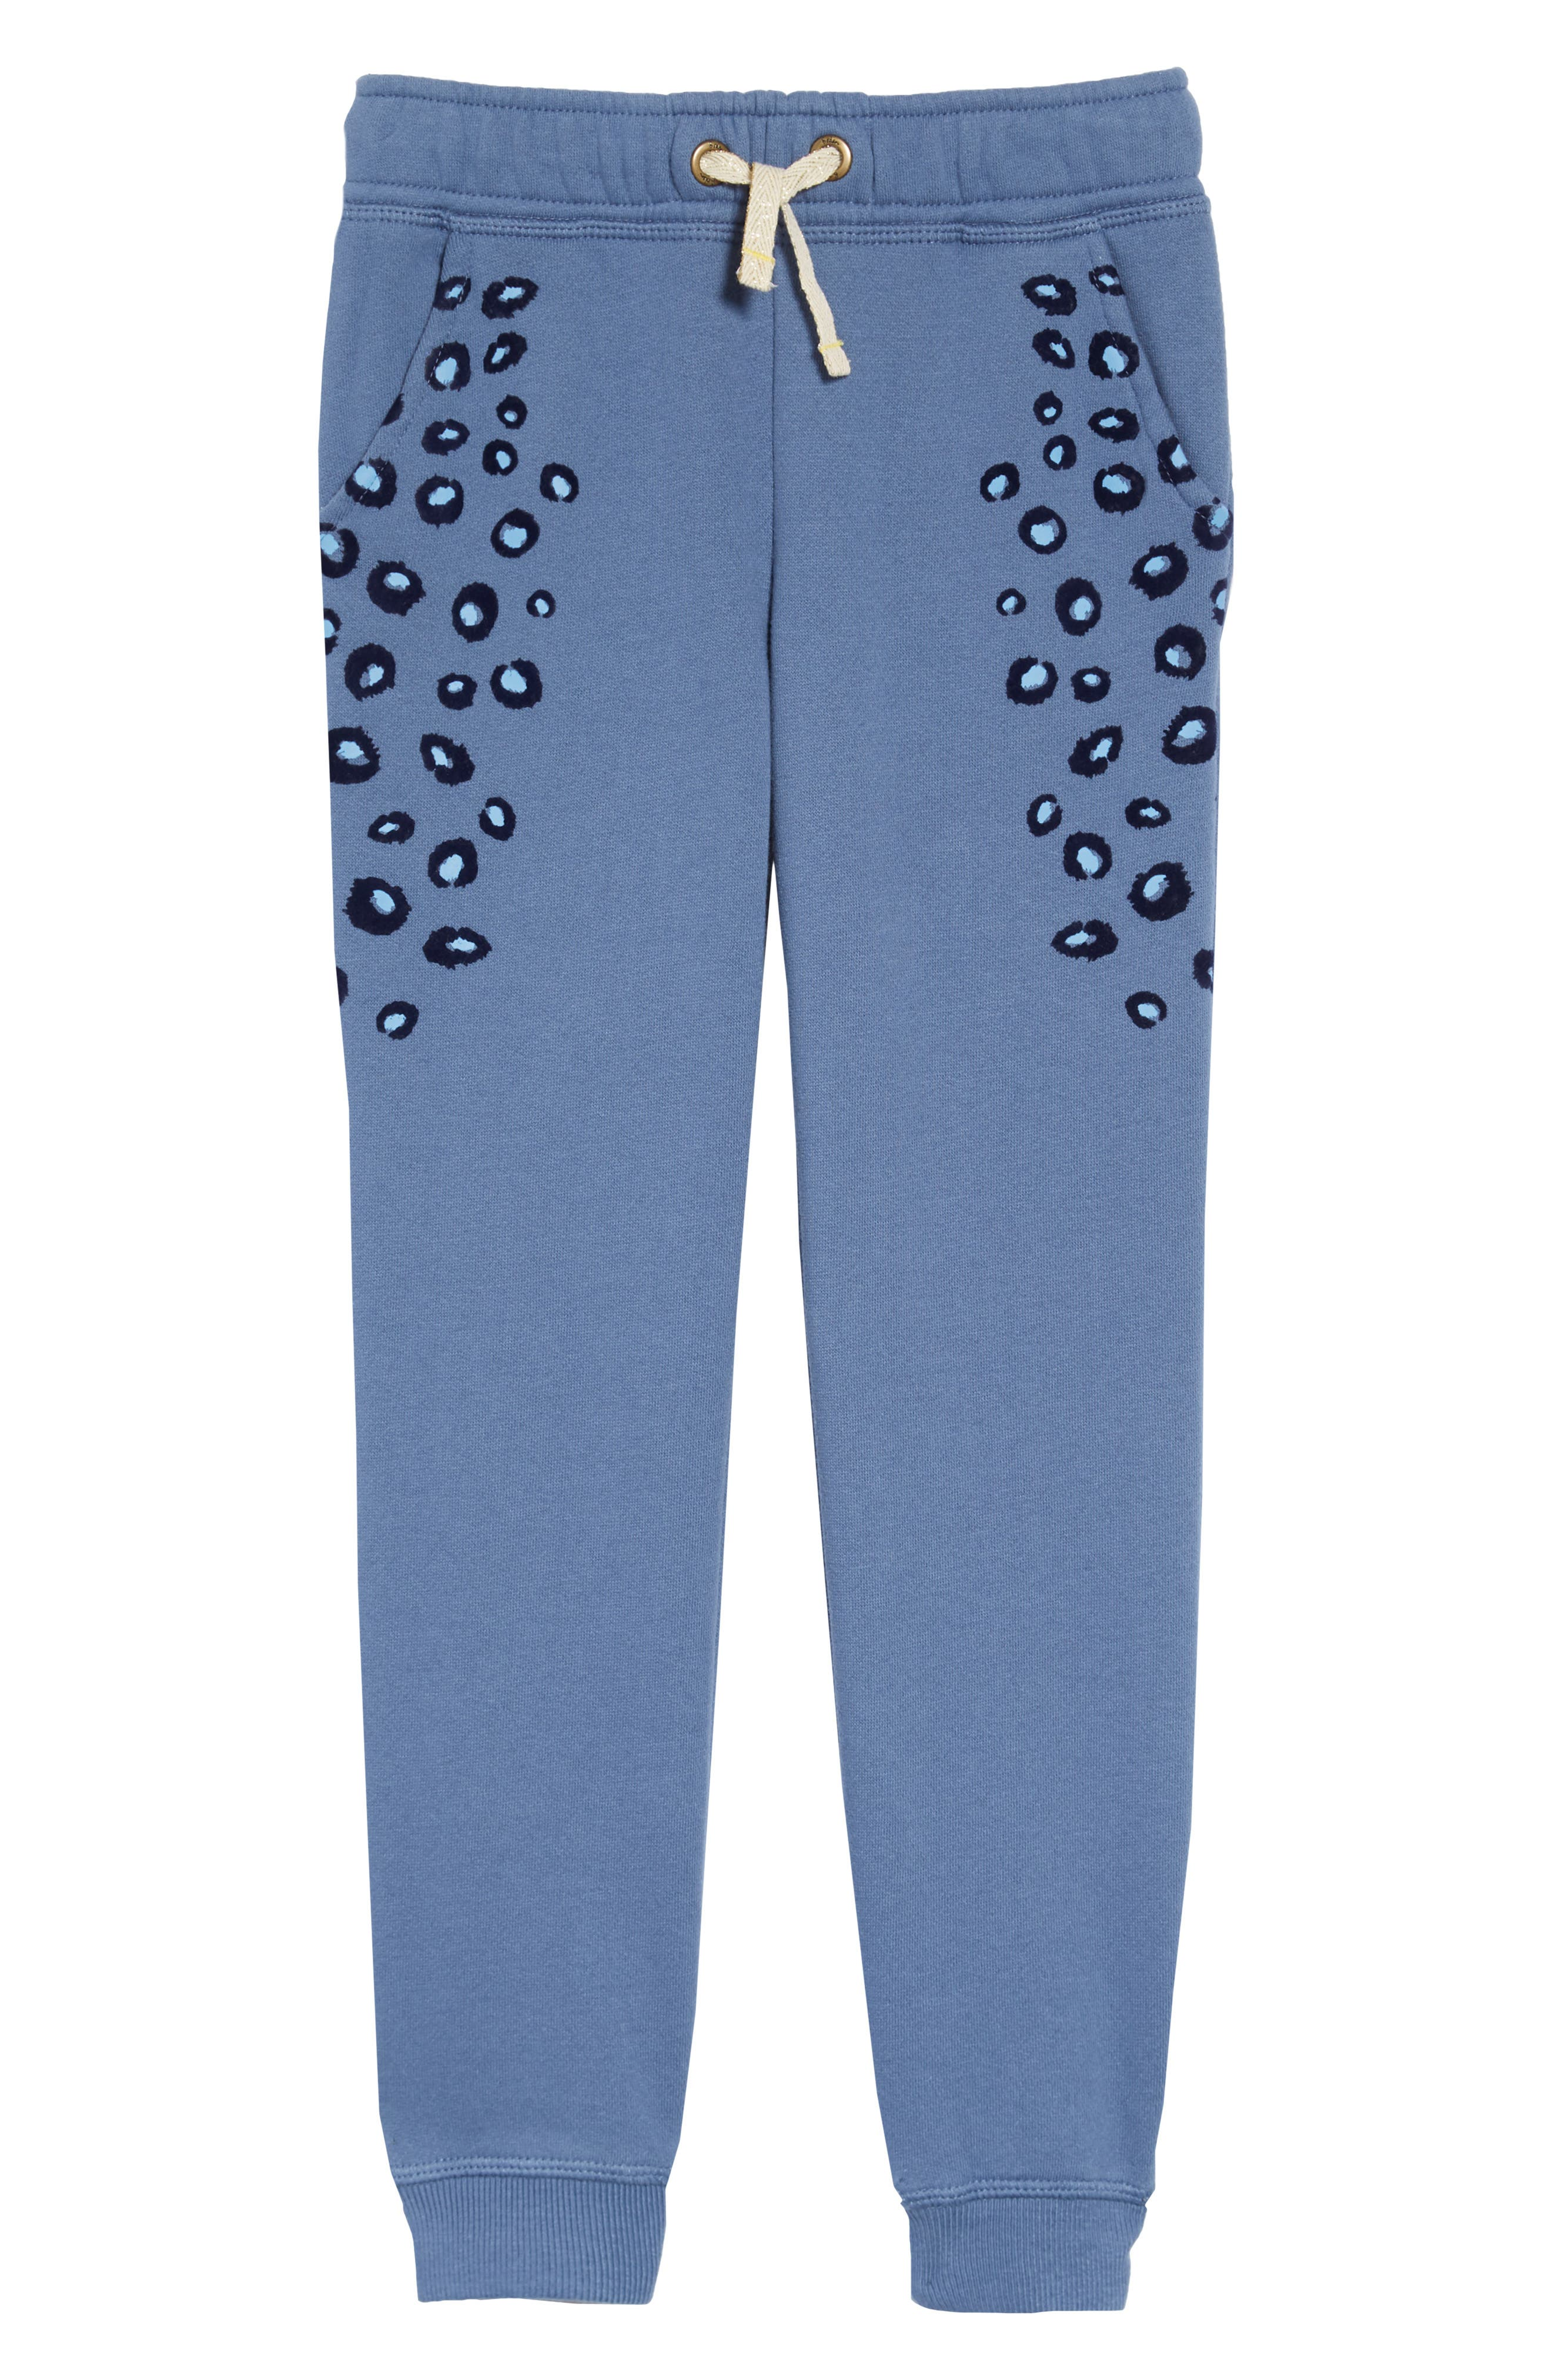 Toddler Girls Mini Boden Side Stripe Sweatpants Size 3Y  Blue